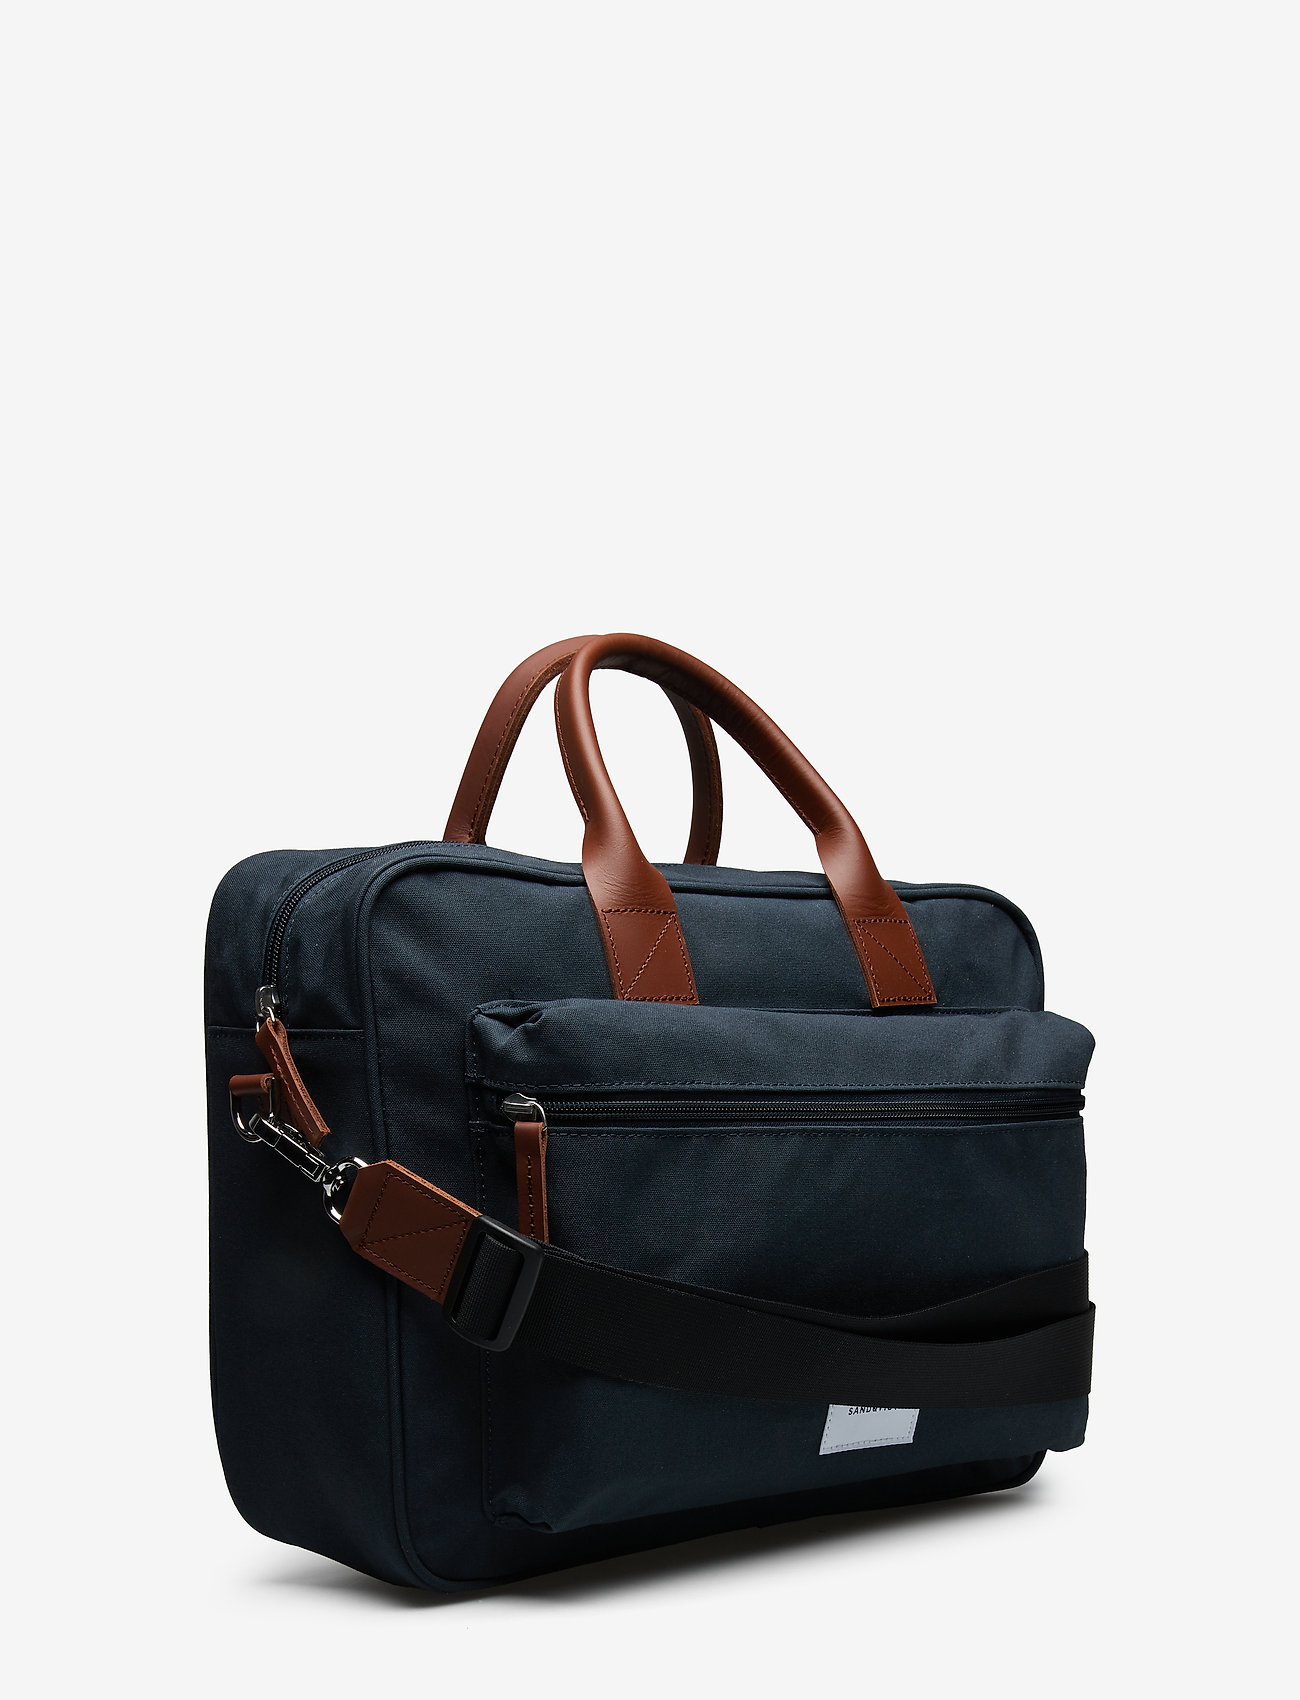 SANDQVIST - EMIL - navy with cognac brown leather - 3